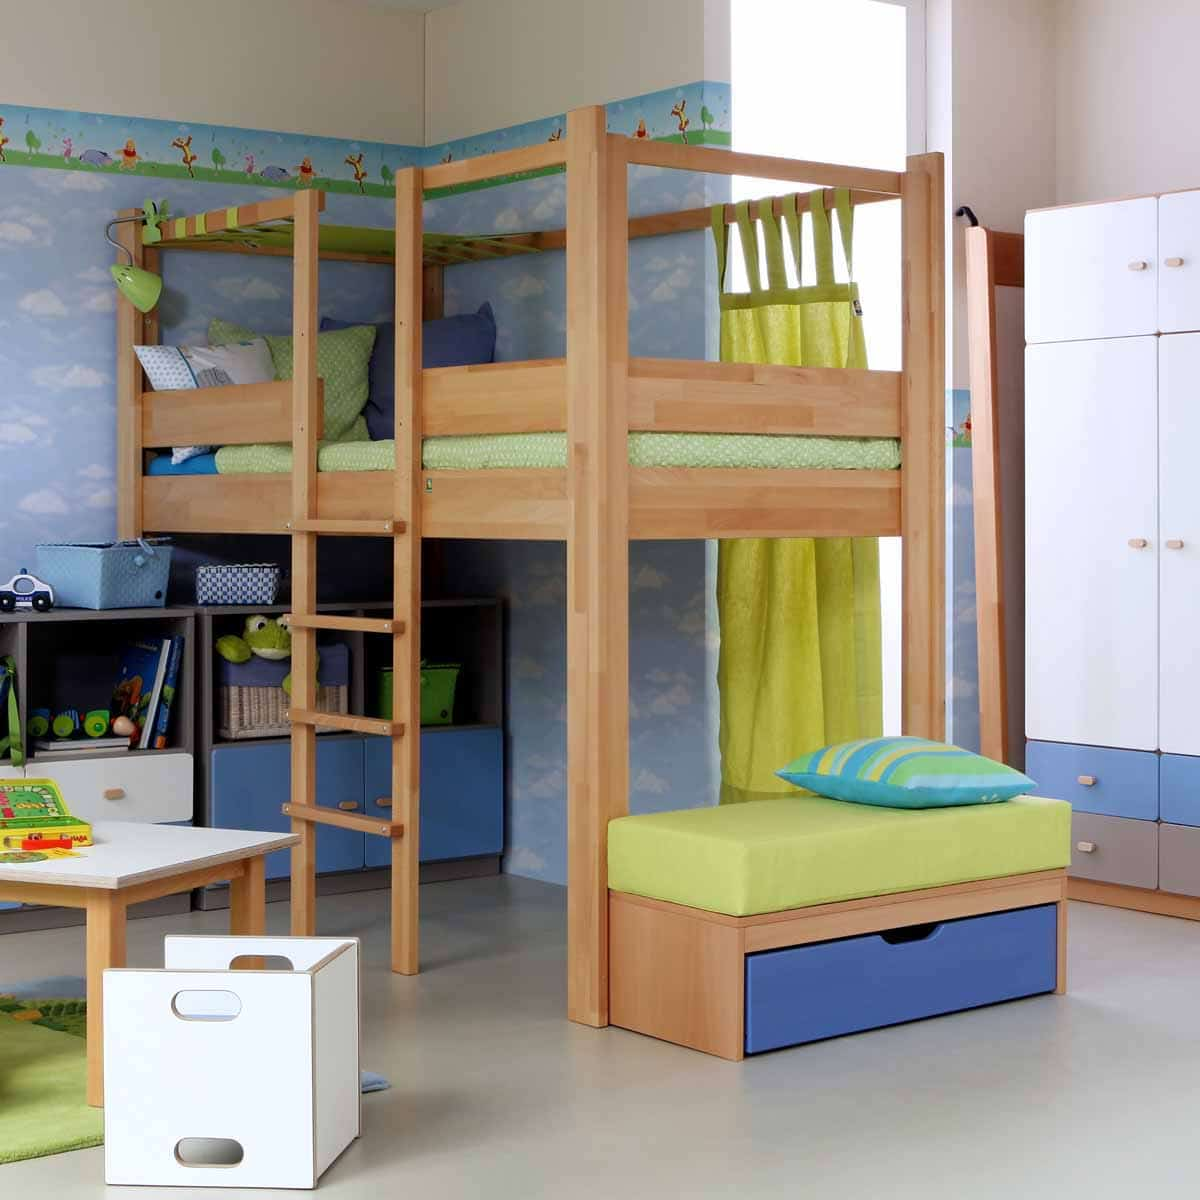 hochbett destyle b hm natur darmstadt. Black Bedroom Furniture Sets. Home Design Ideas